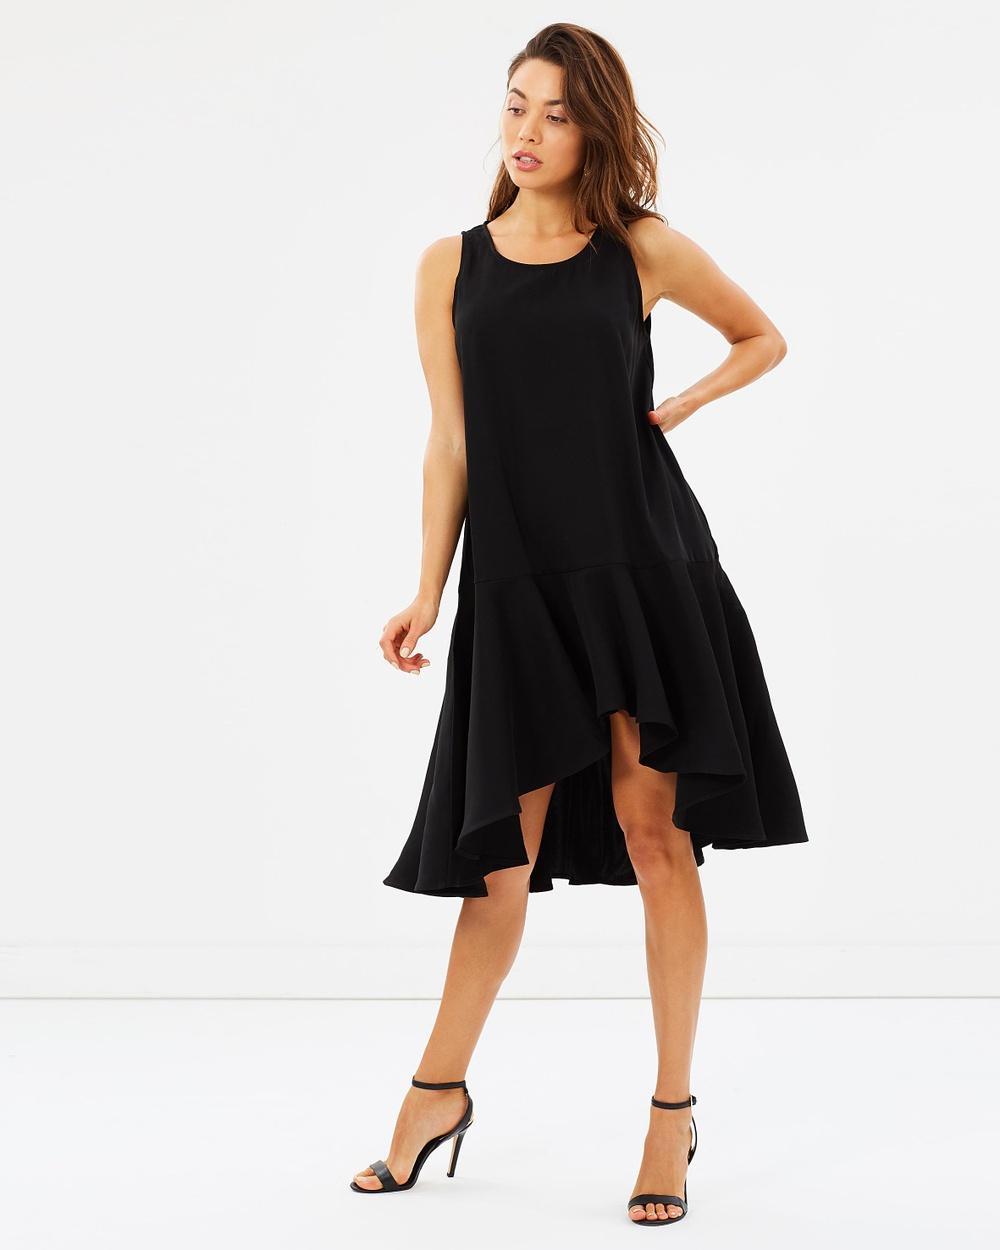 Mossman The Memory Remains Dress Dresses Black The Memory Remains Dress